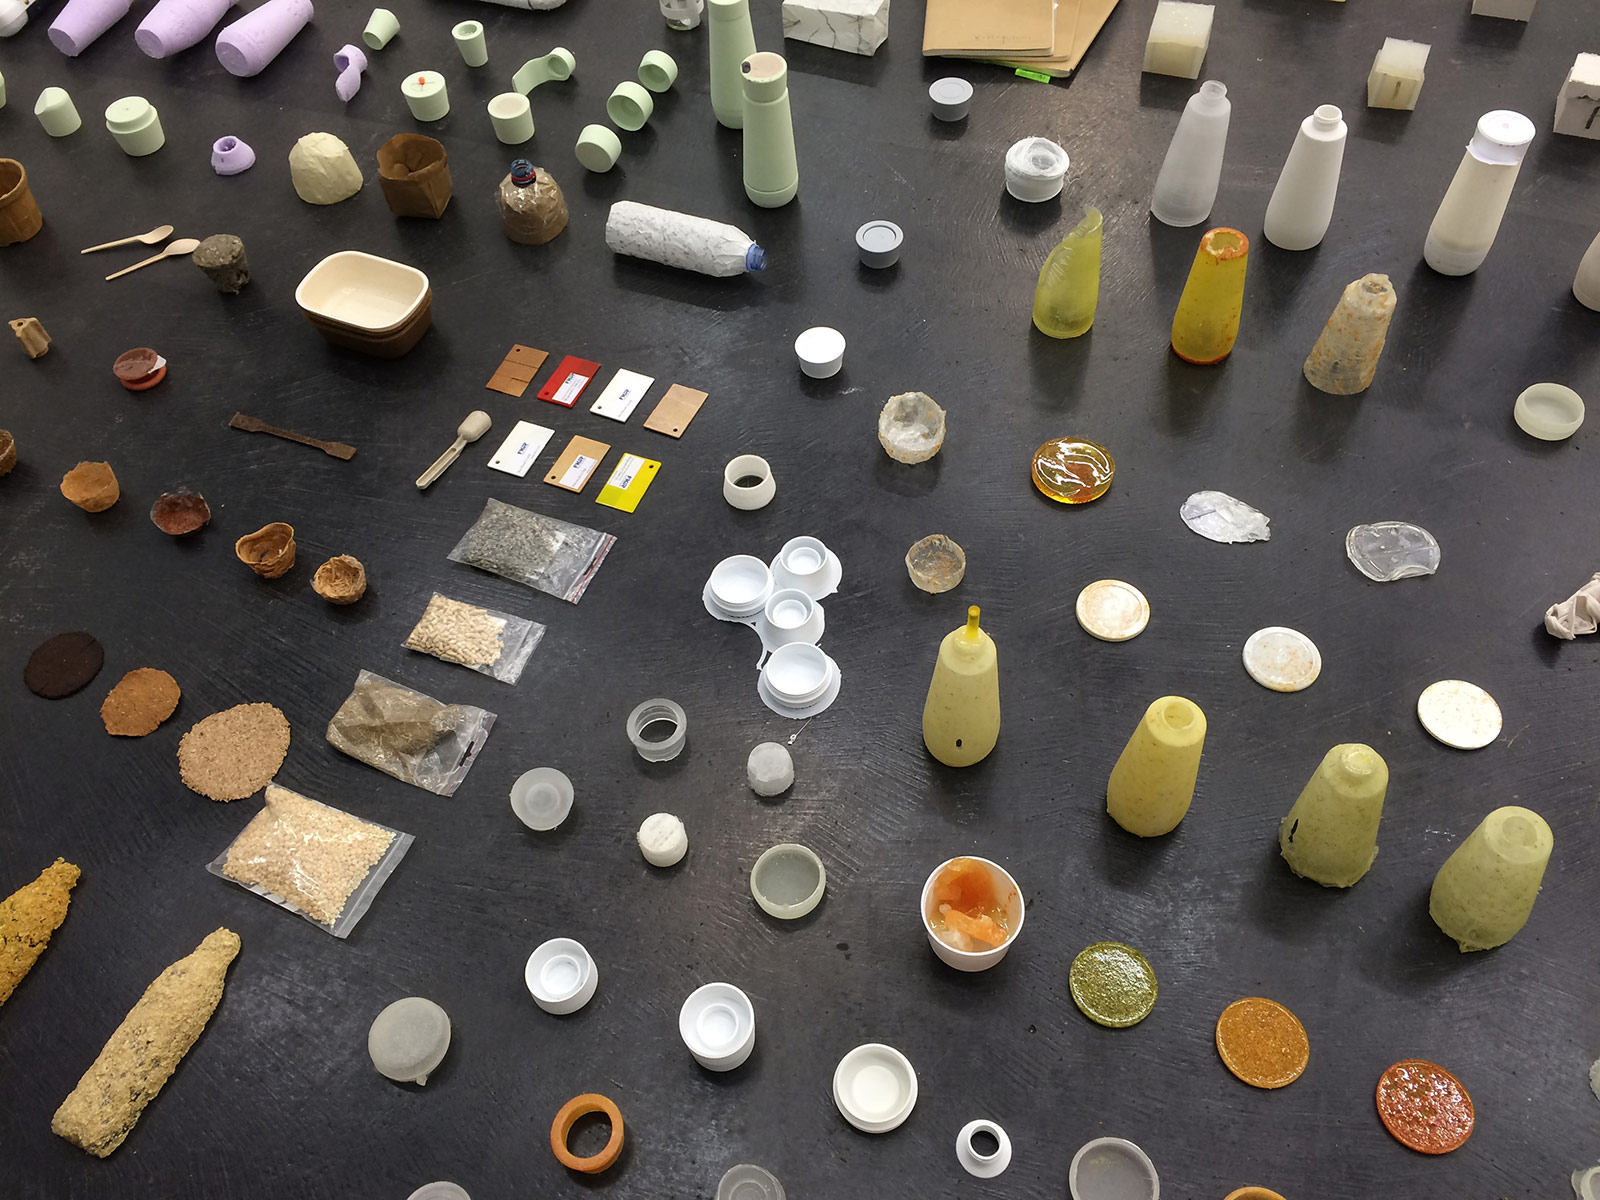 Christine Barbara Baumann «Festival Dopper» | Industrial Design, Diplom Bachelor 2016,